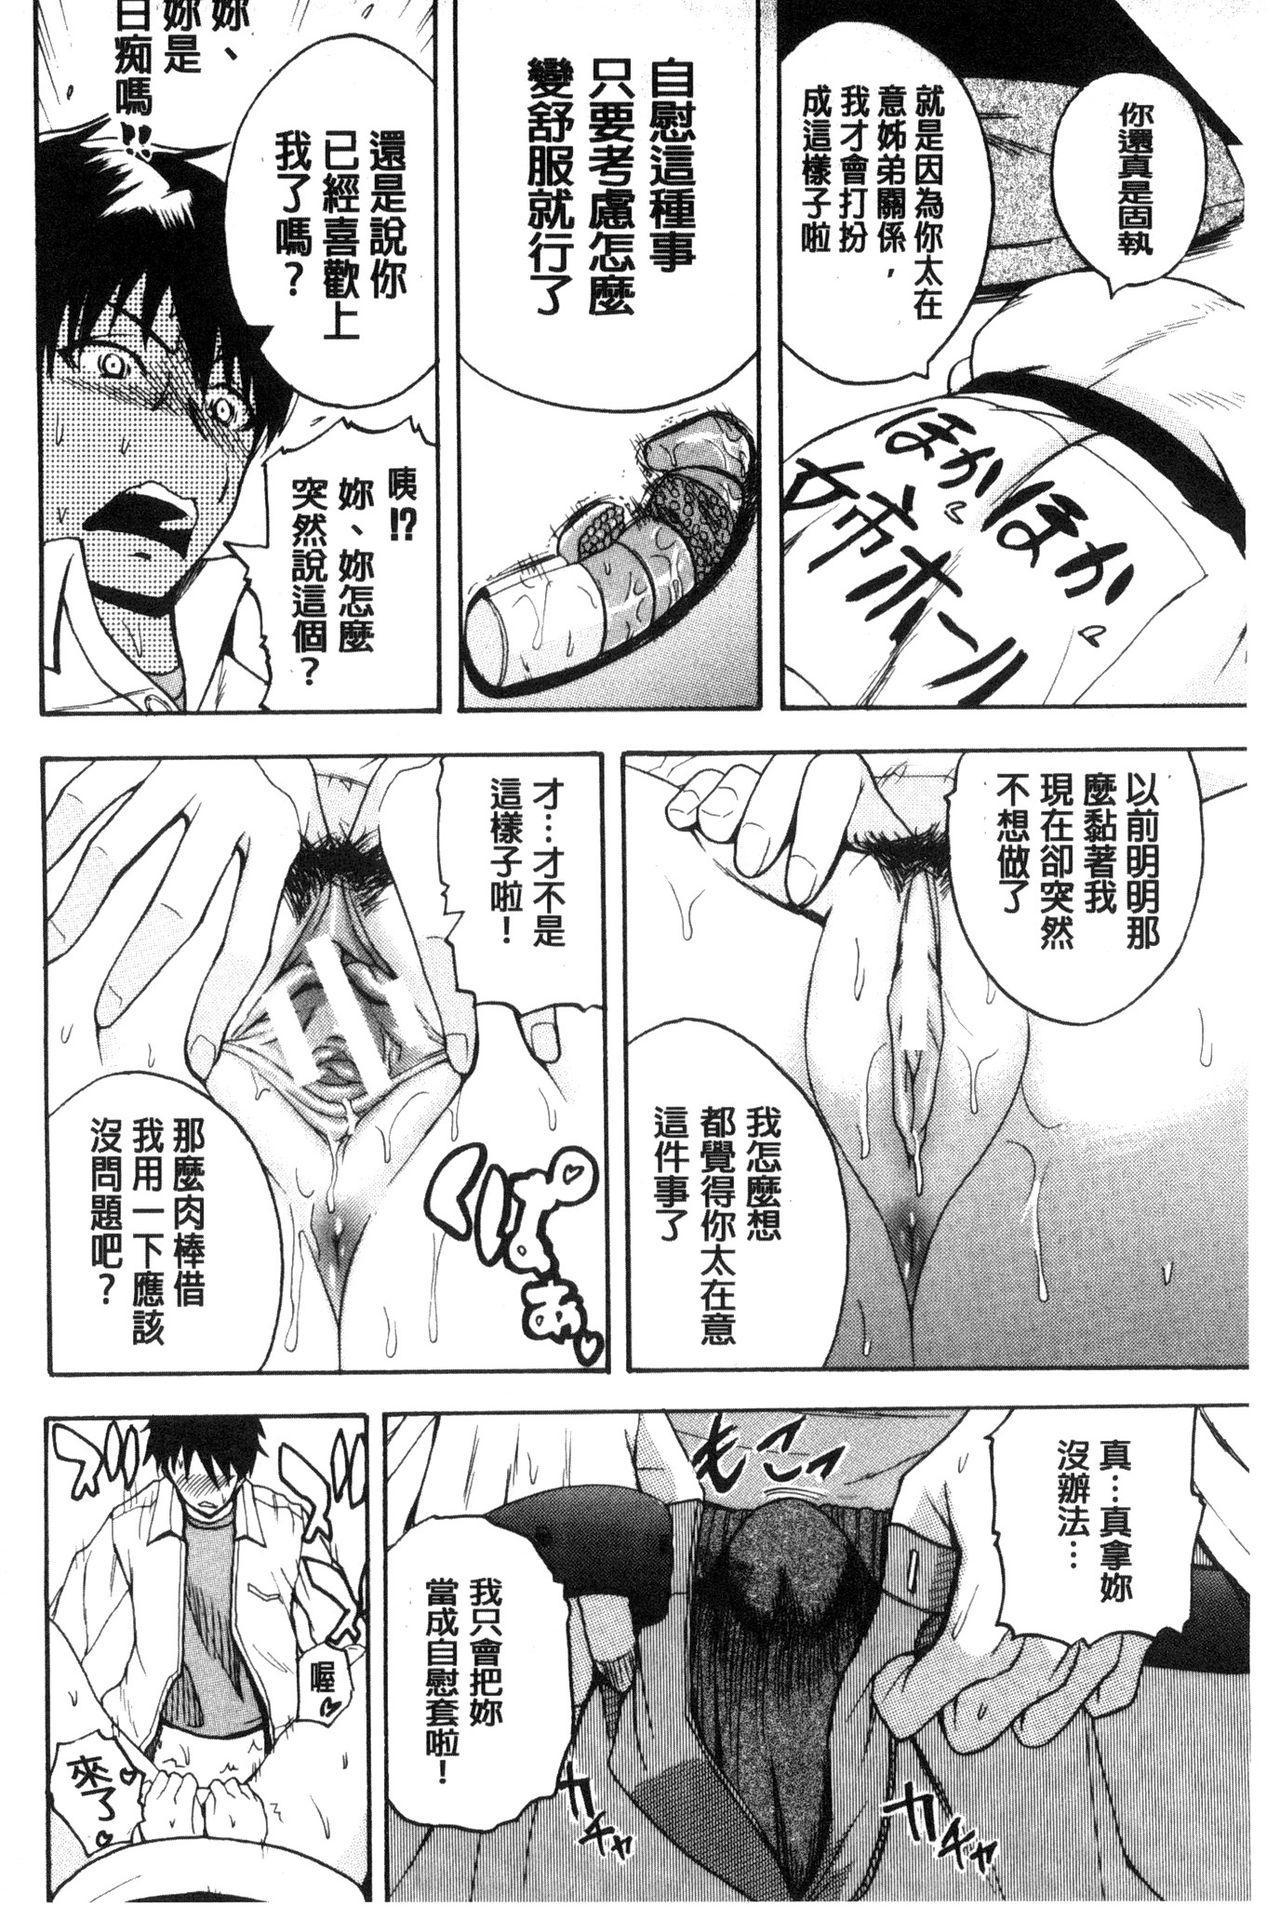 Opink Health Seibo no Fukuin 176